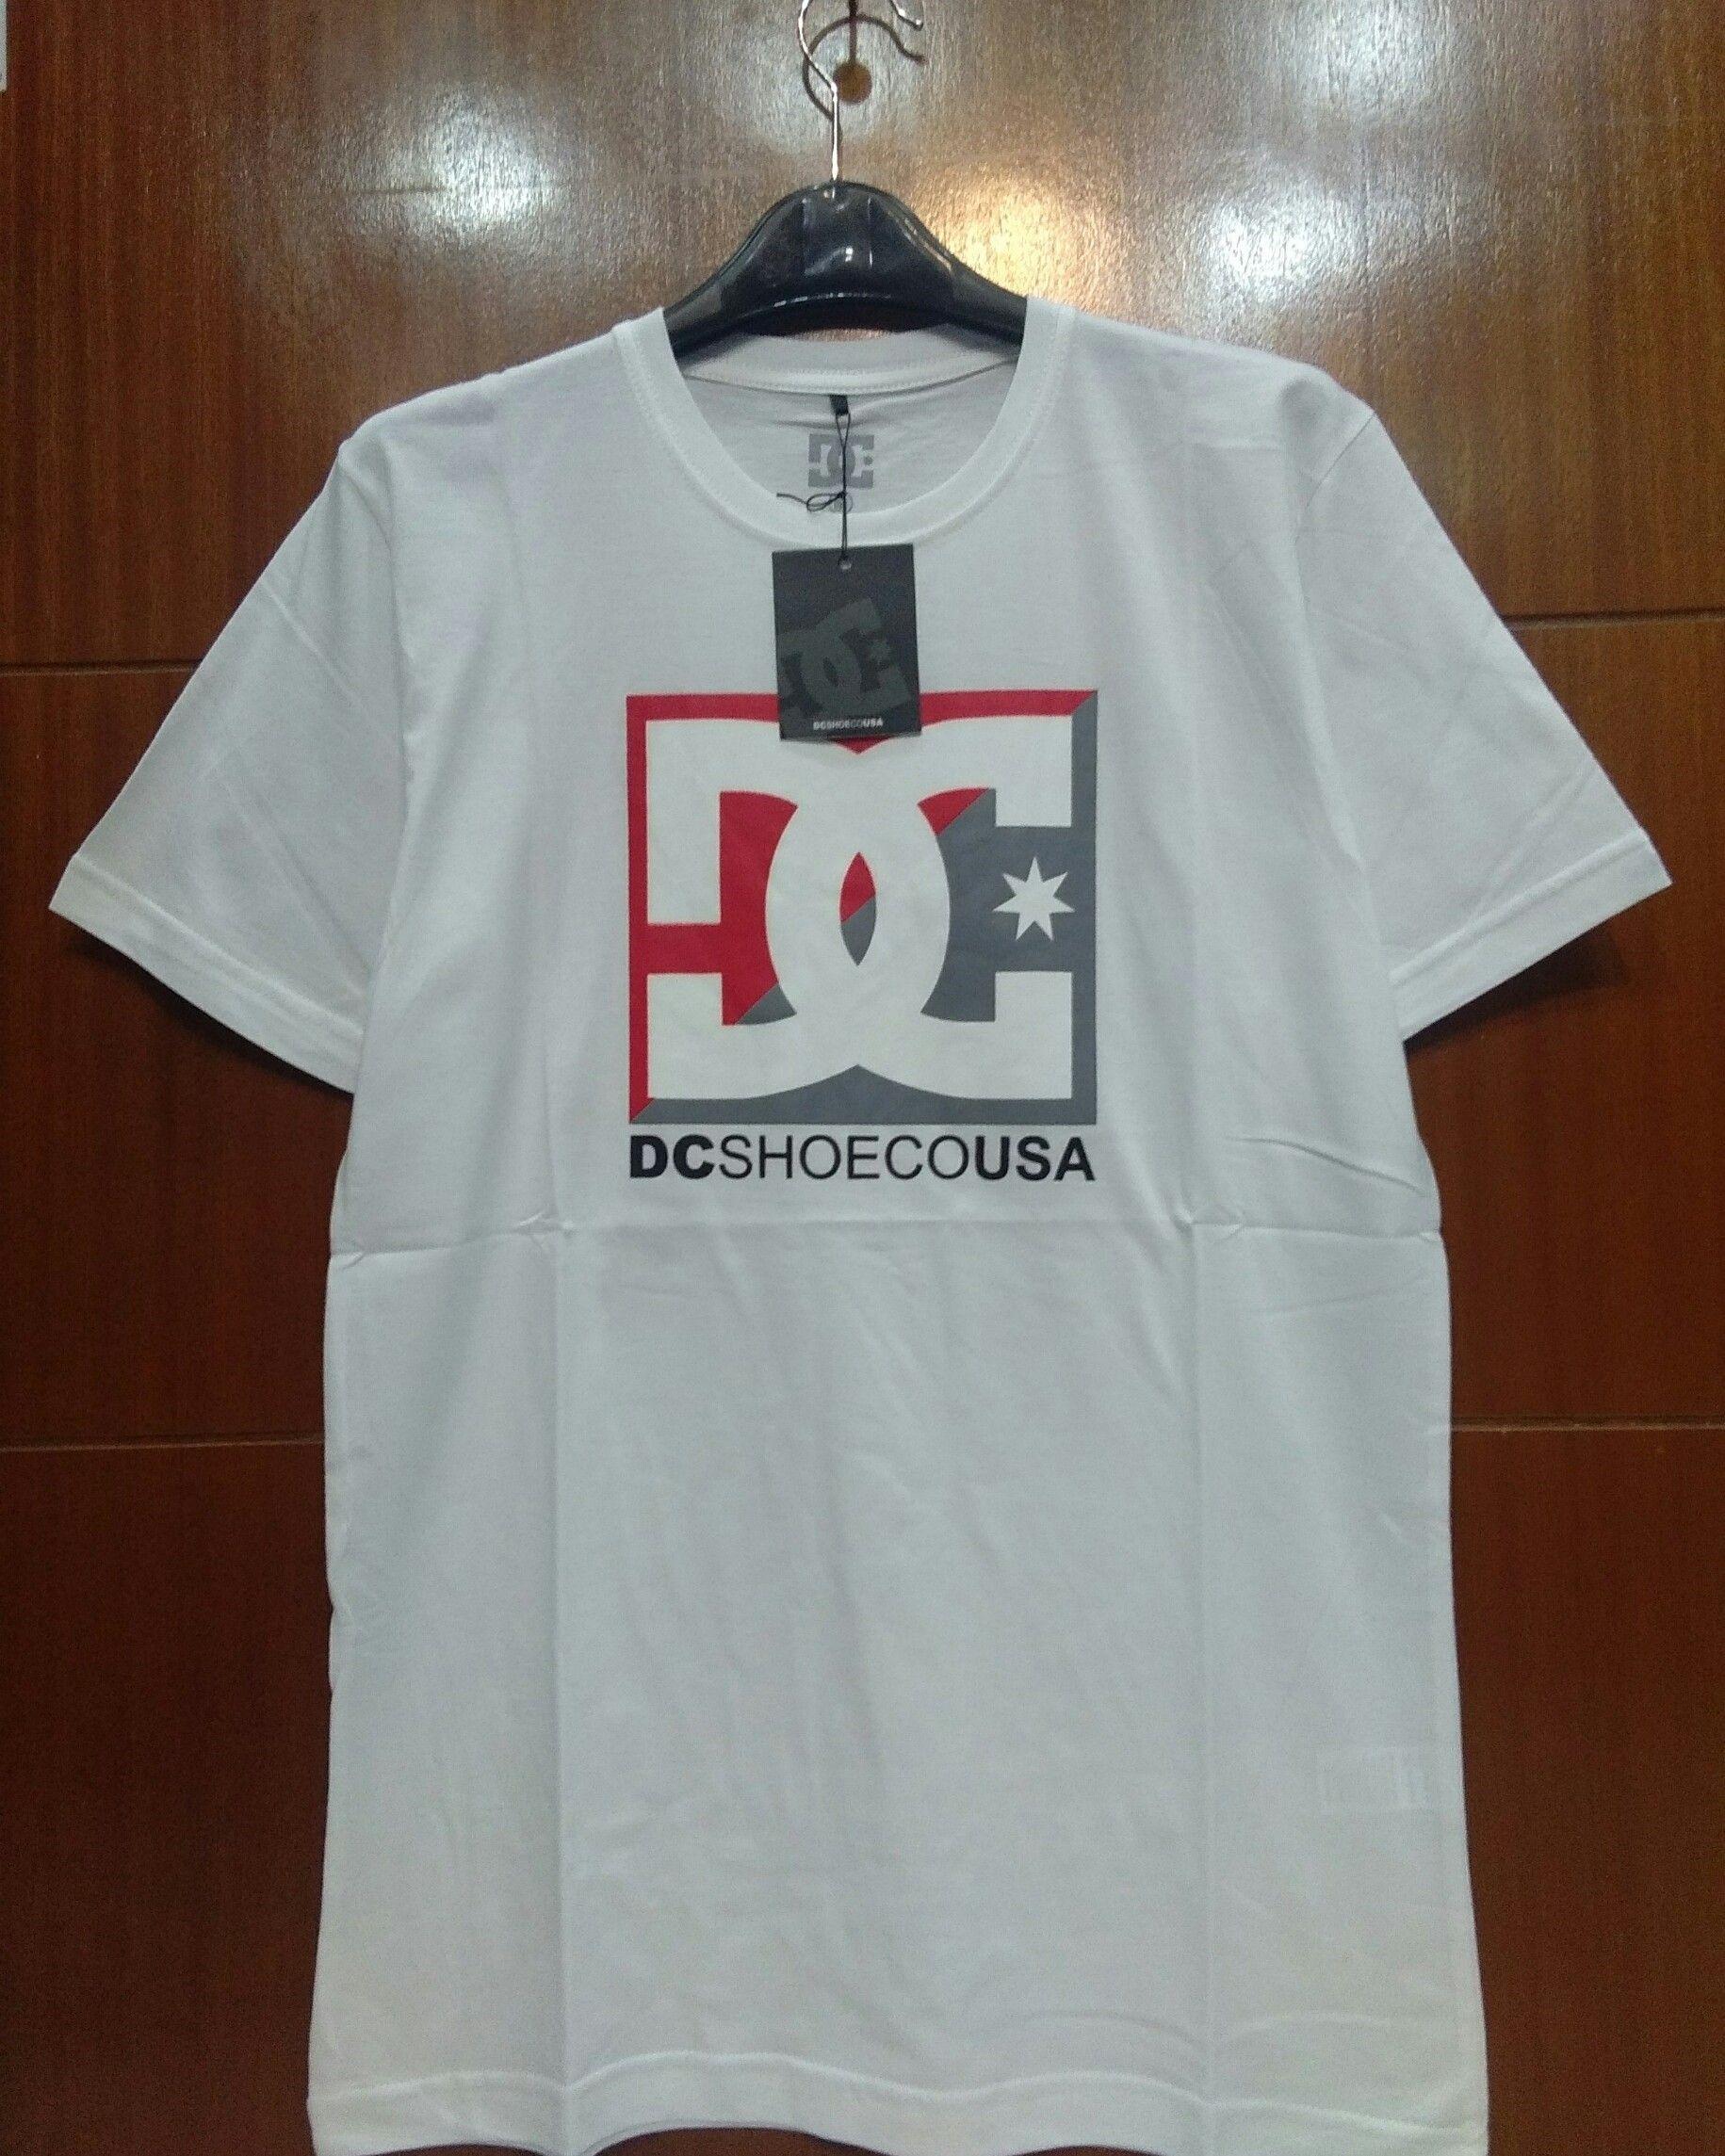 Grosir Kaos Distro Murah di Bandung • AgeraGrosirDistro